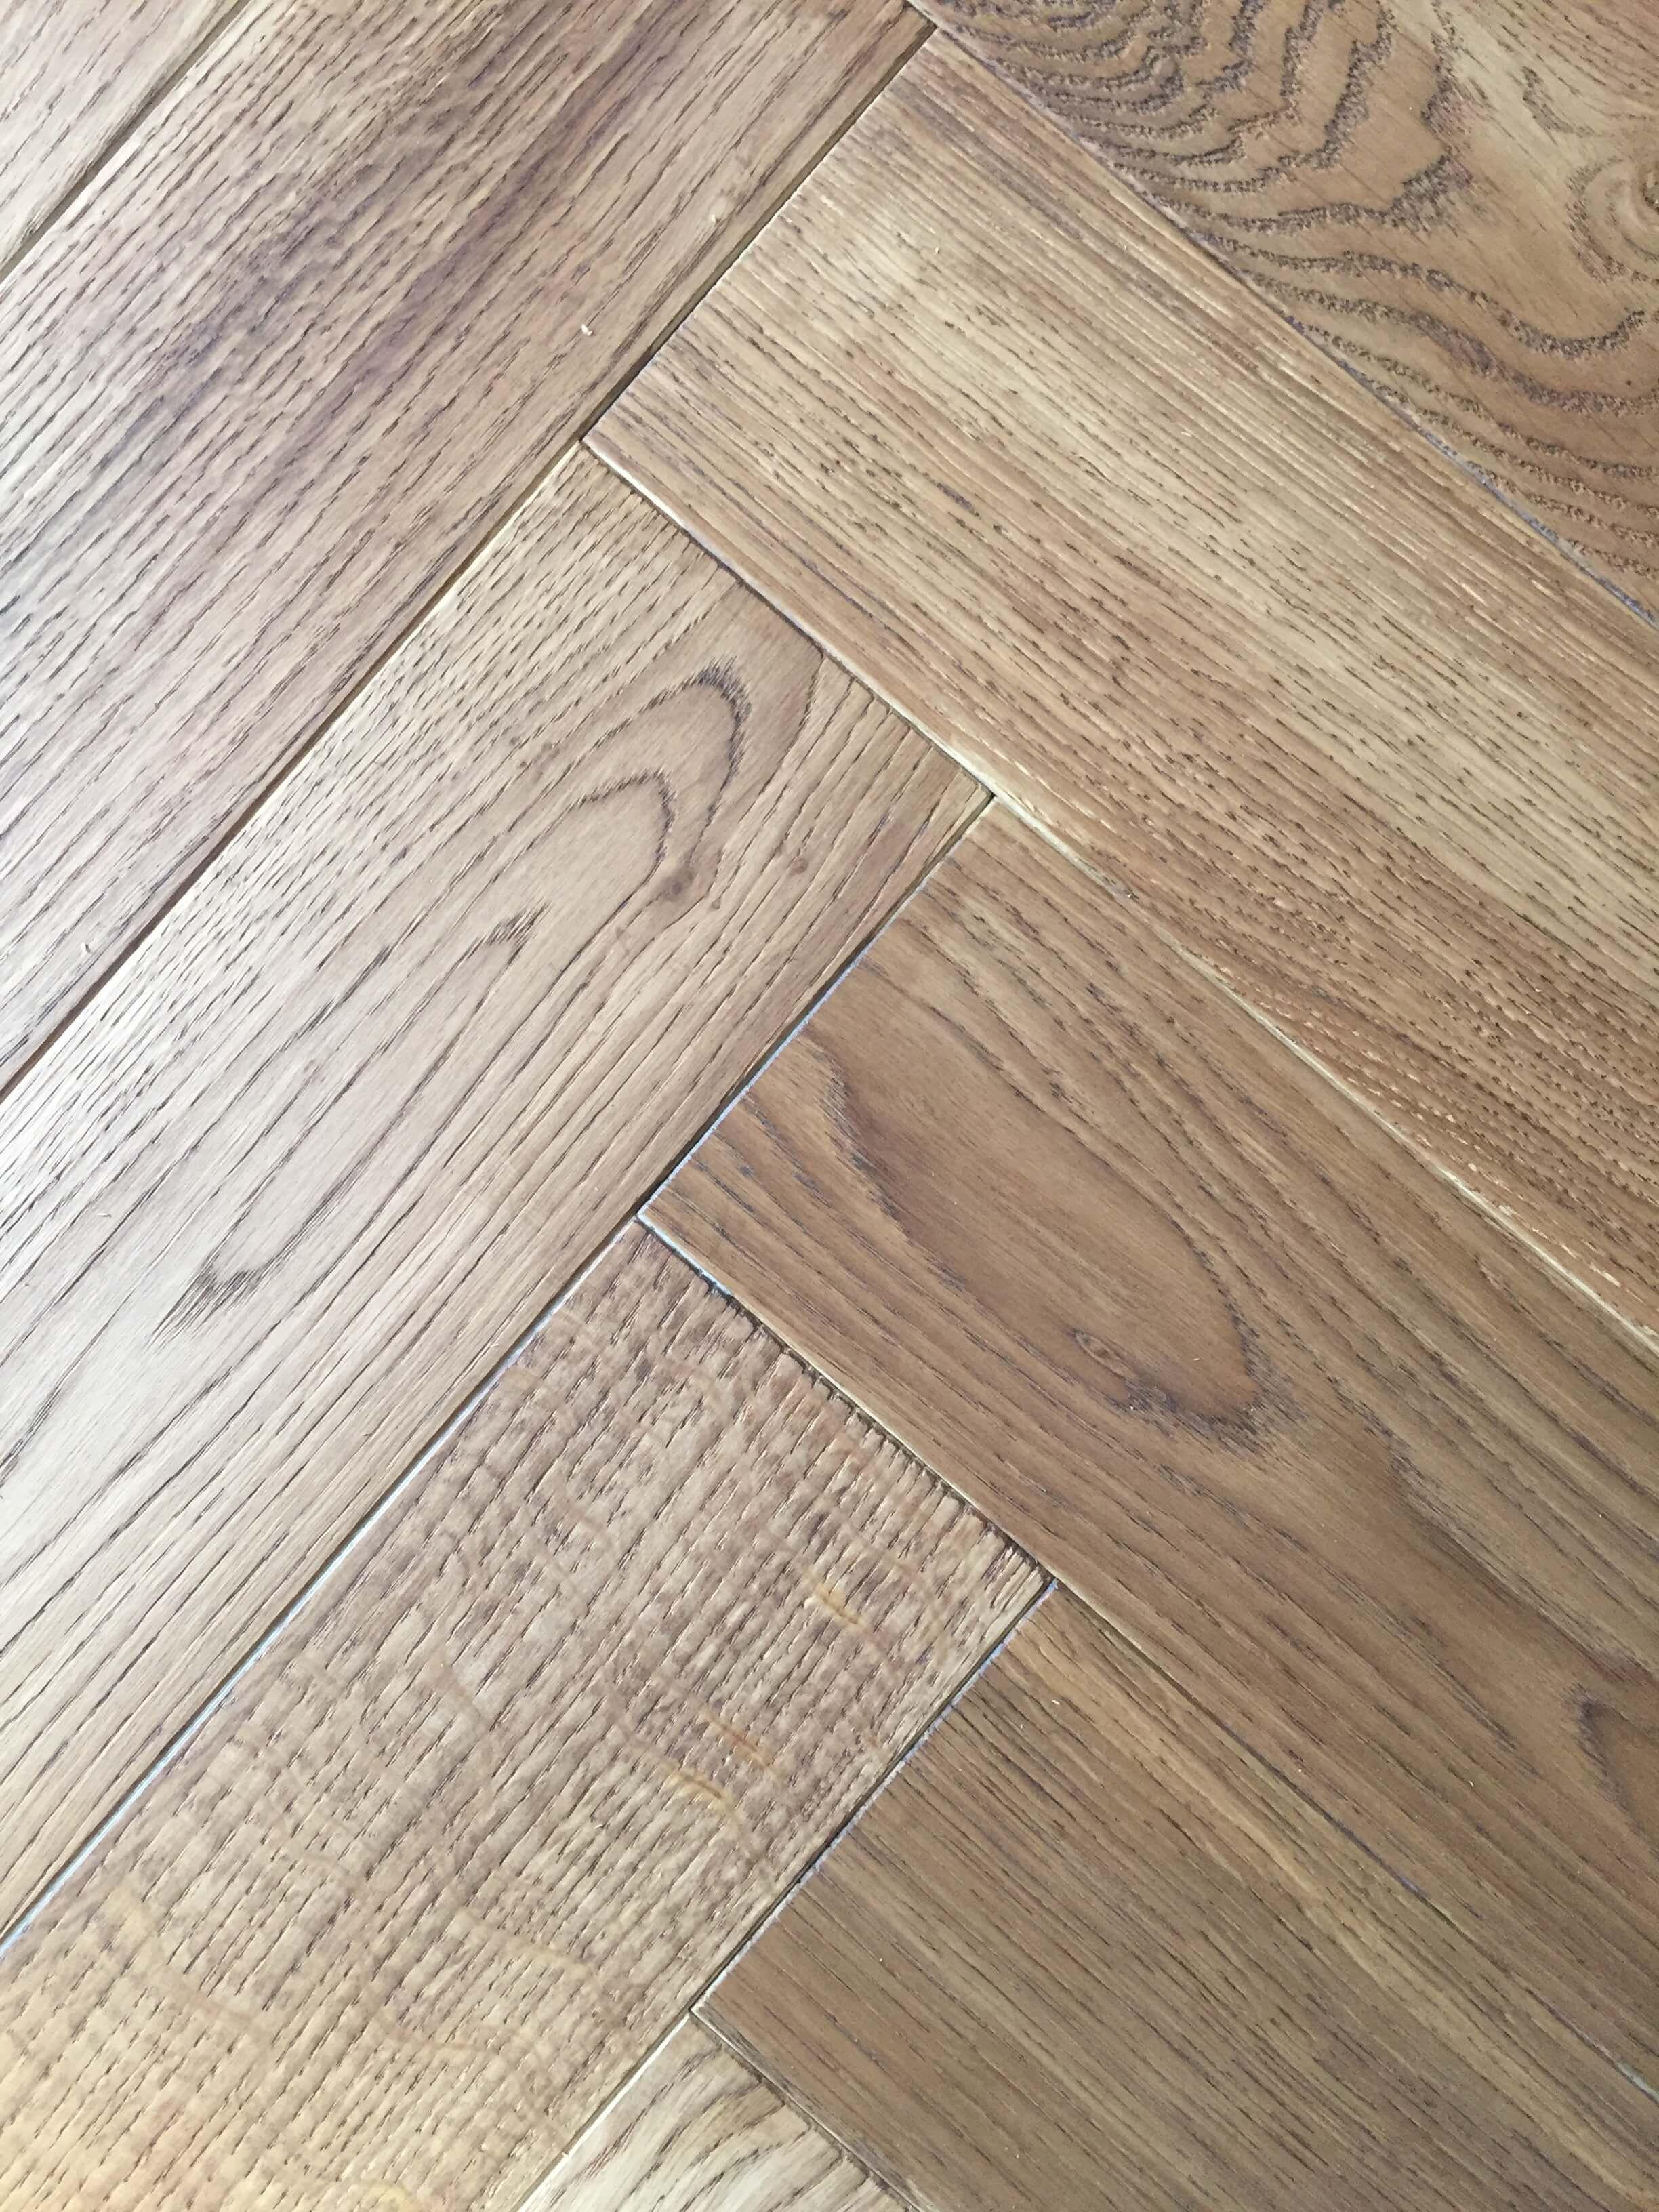 floating hardwood floor underlayment of laminate hardwood flooring beautiful laminate flooring versus intended for 40 light oak engineered hardwood flooring ideas